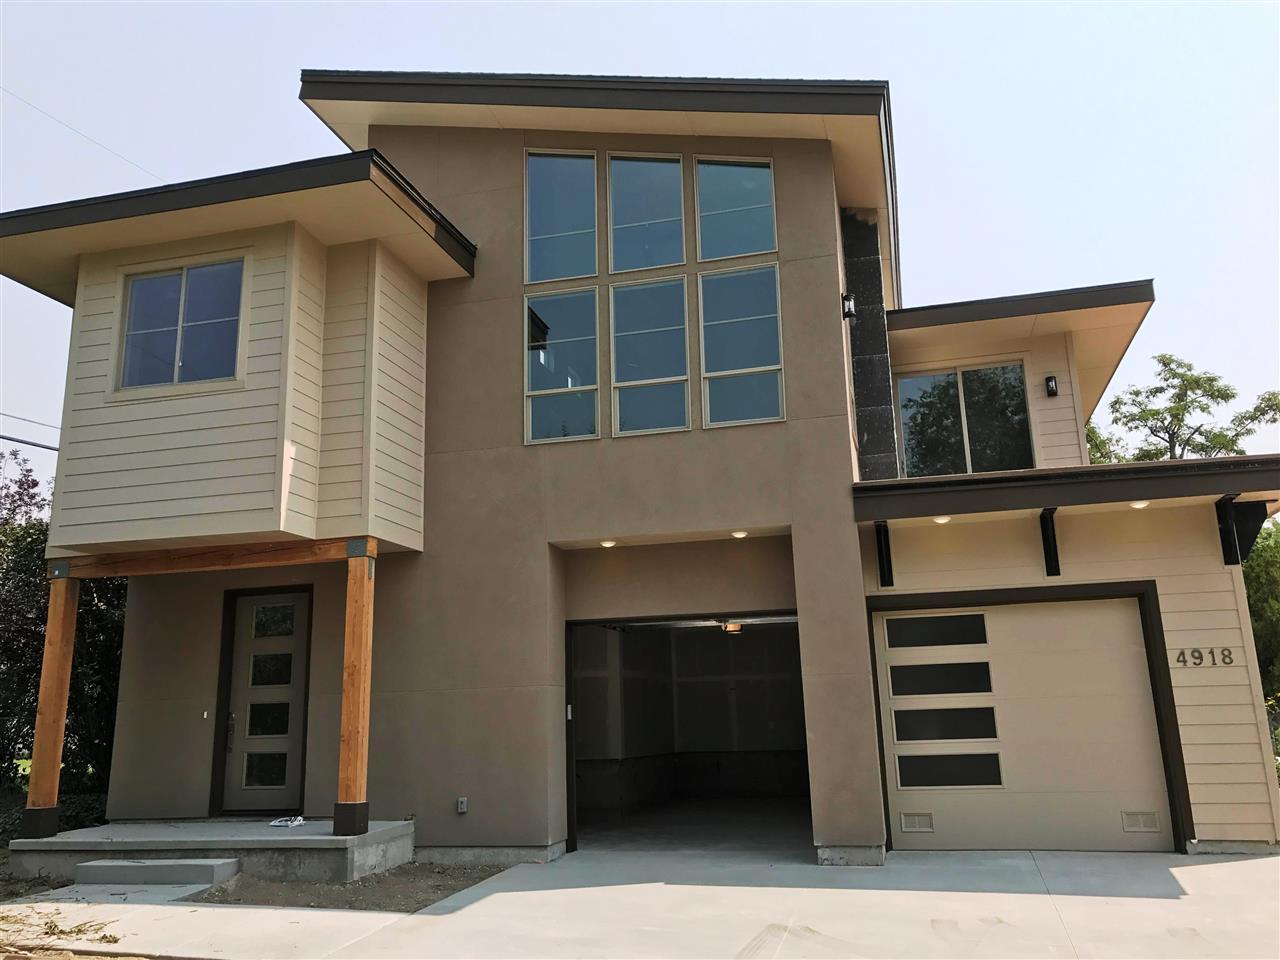 4918 Hill Rd, Boise, ID 83703